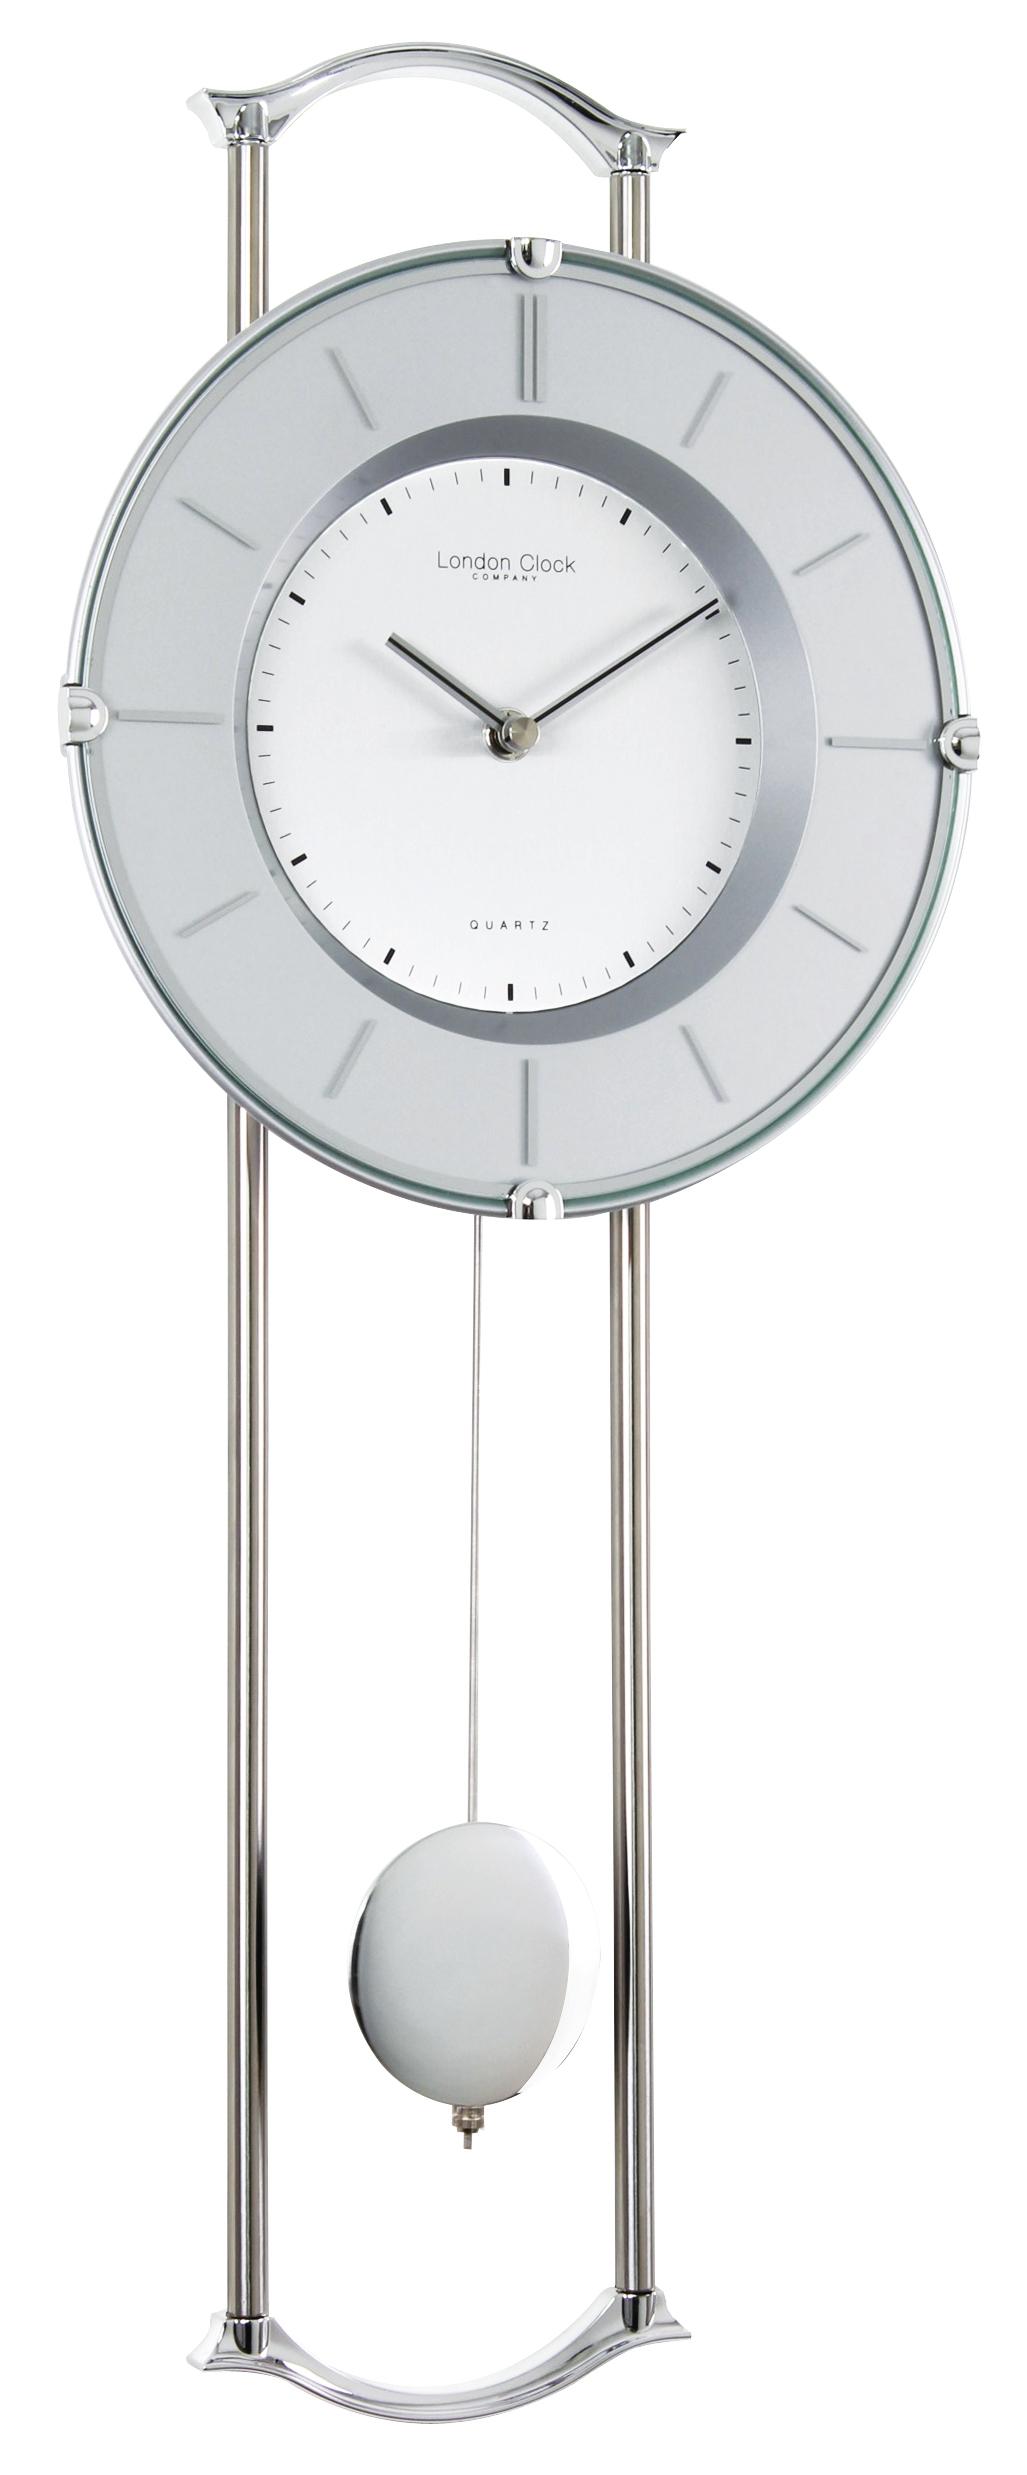 London clock company silver chrome finish contemporary pendulum wall clock ebay - Contemporary pendulum wall clocks ...